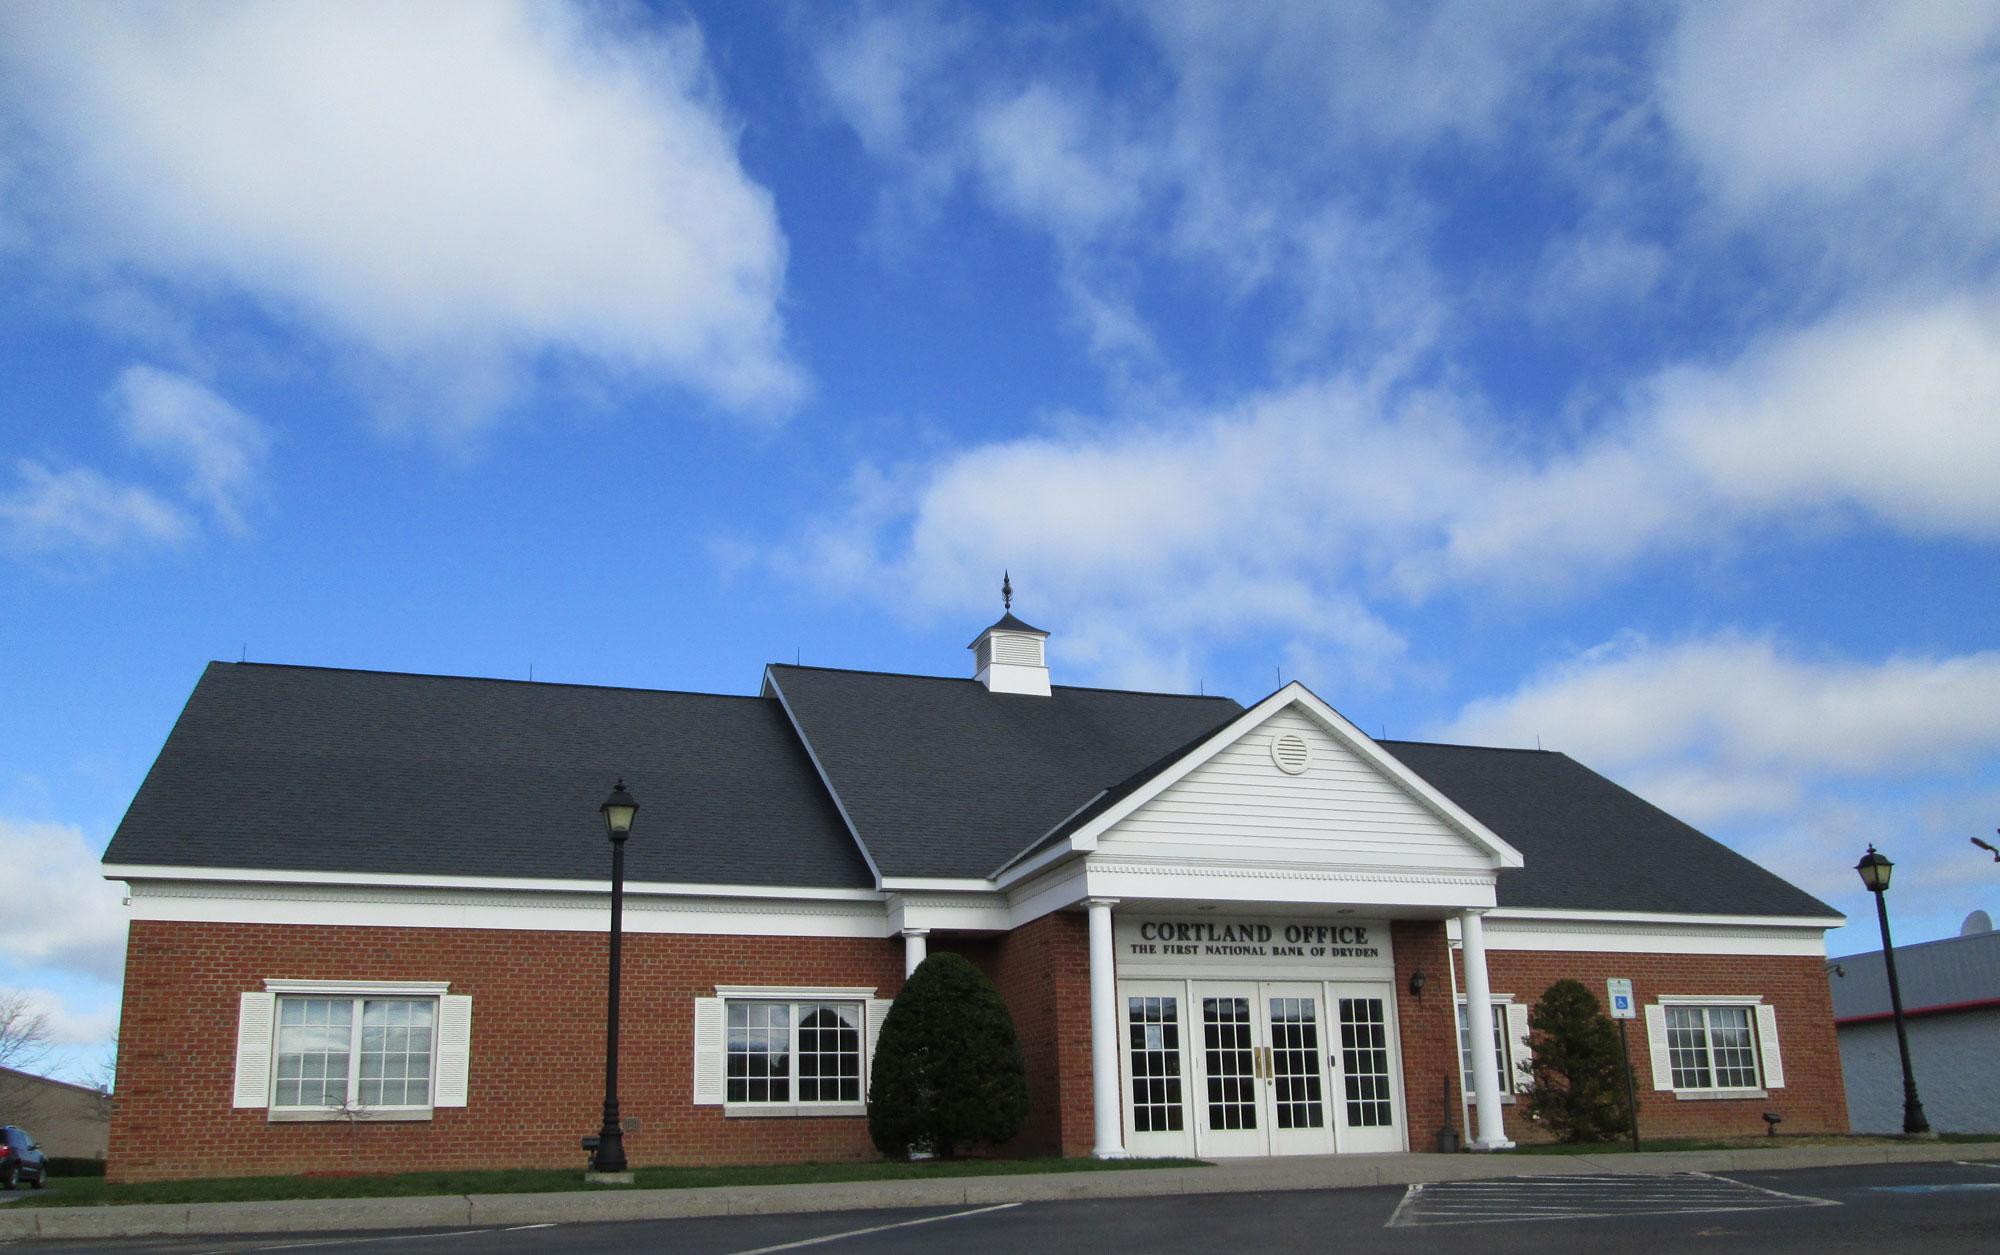 Cortland Office